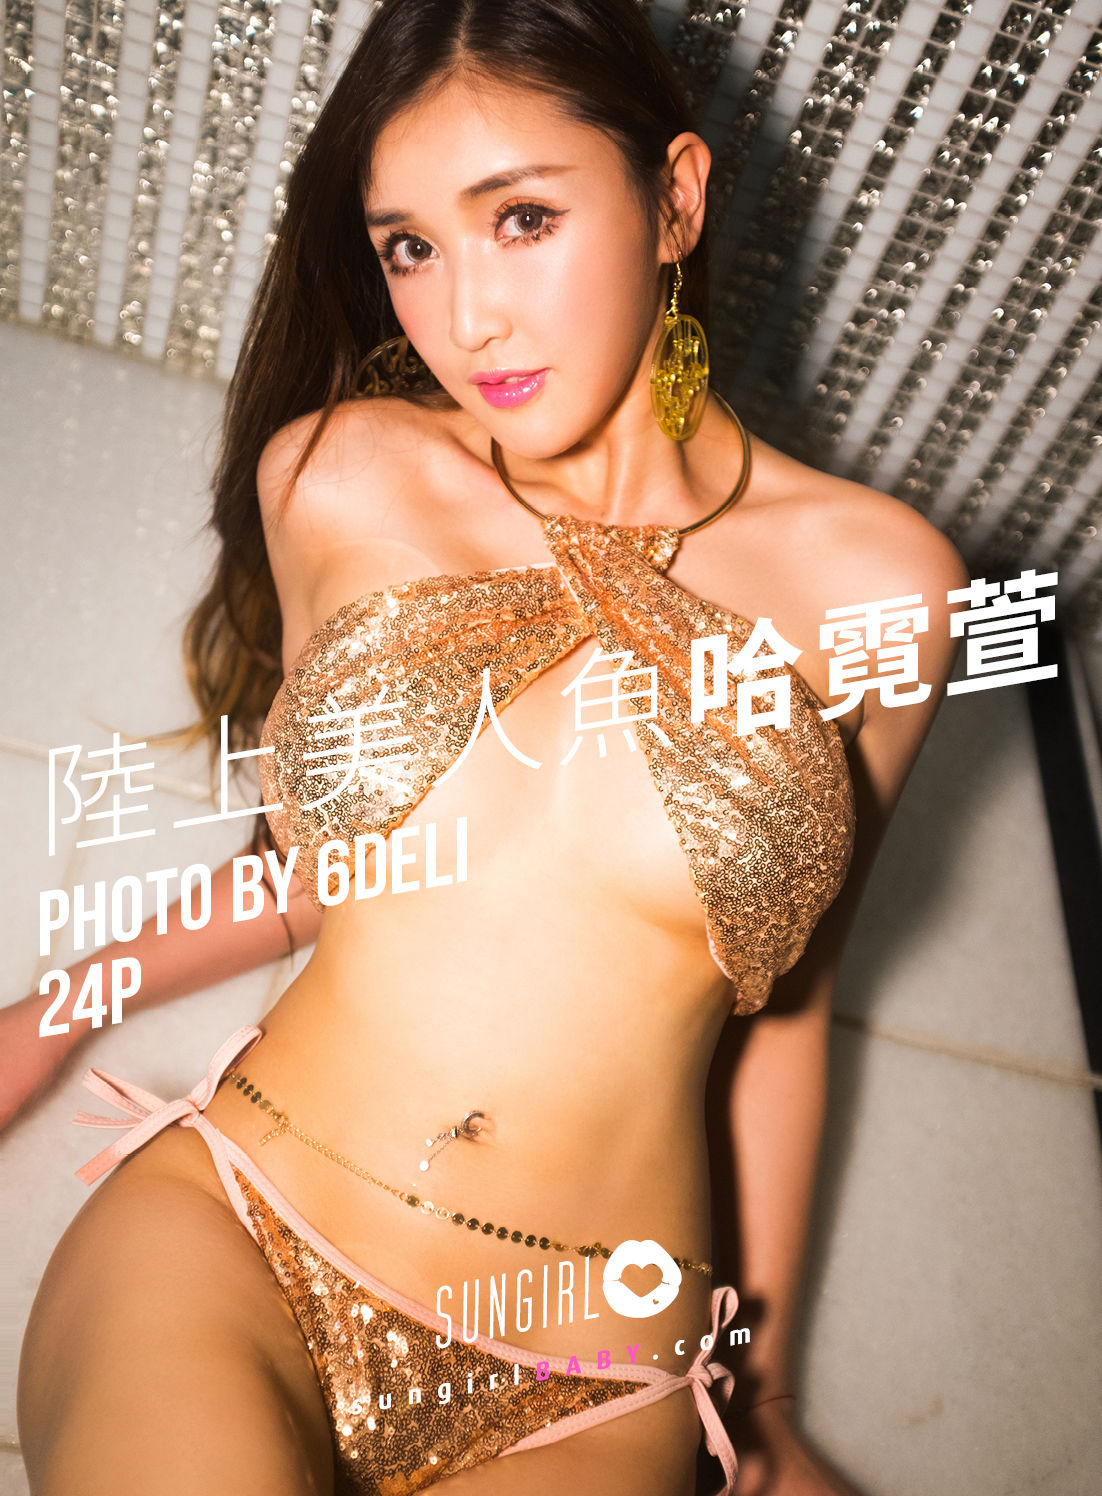 VOL.824 [阳光宝贝]泳装美乳风骚:任育萱(腿模Vanessa)超高清个人性感漂亮大图(24P)